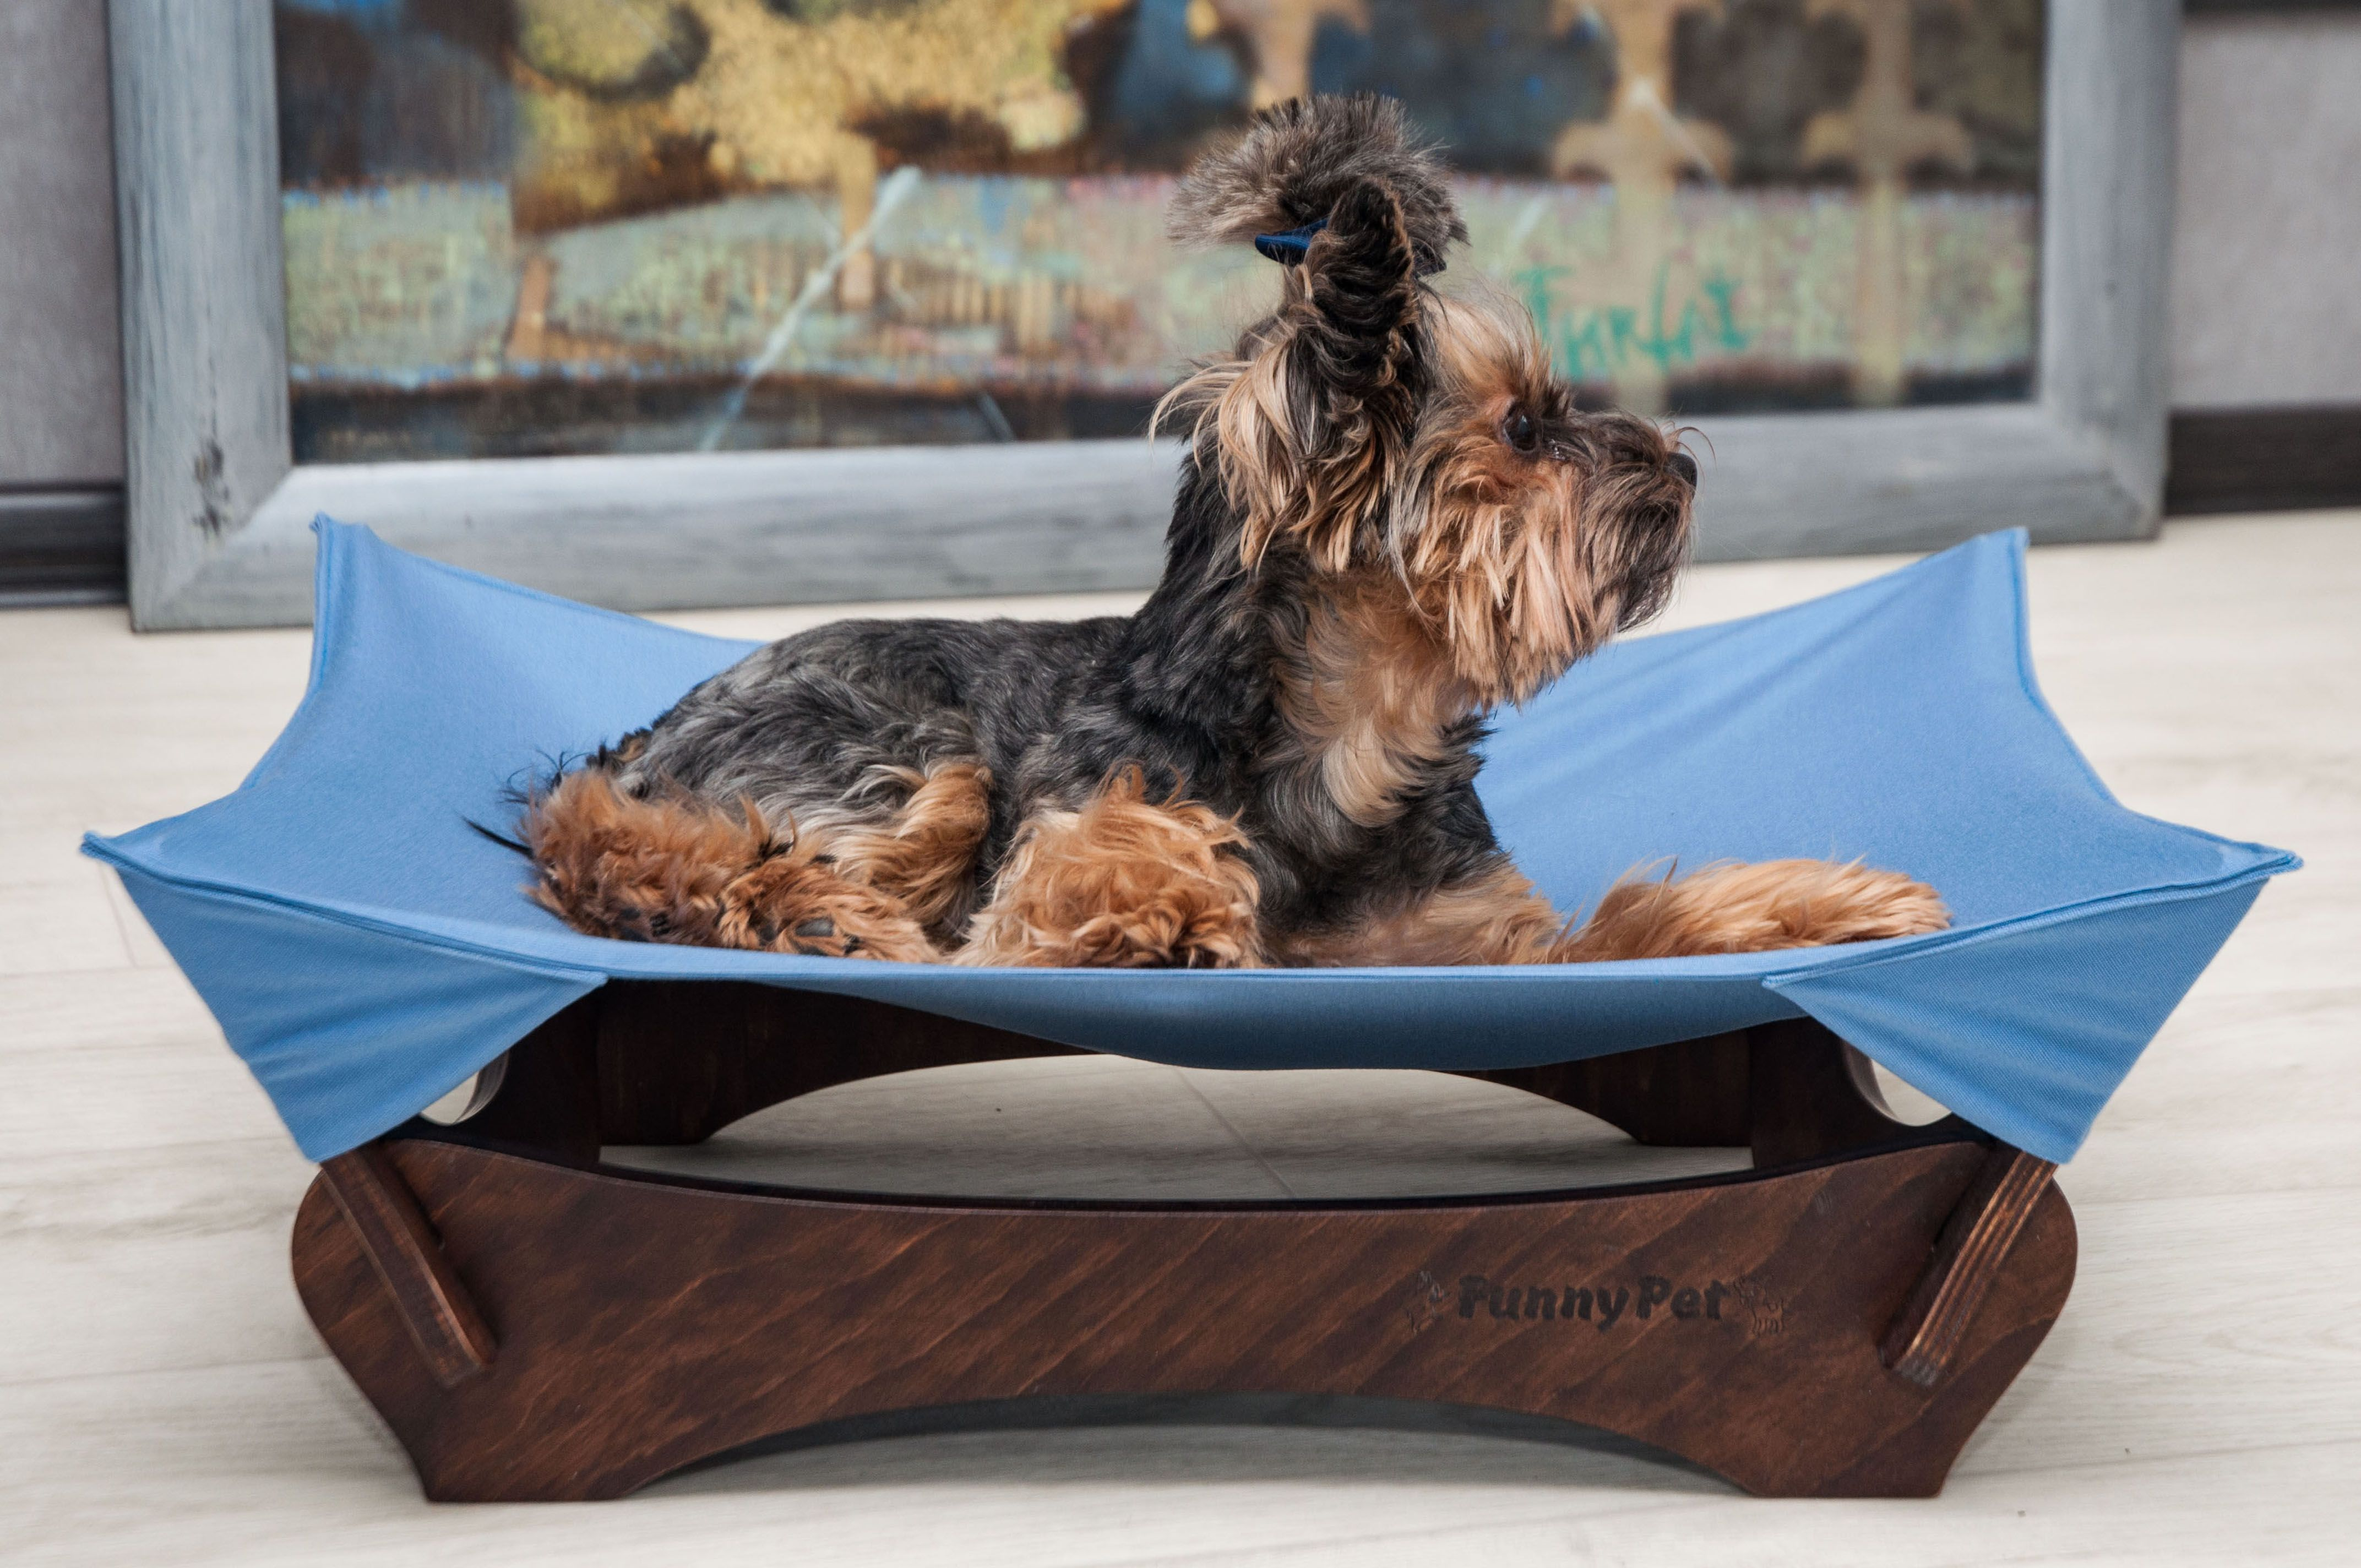 hammocks hsglbar dfohome nt stripe hammock with bar spreader natural ftlr colombian dog xx